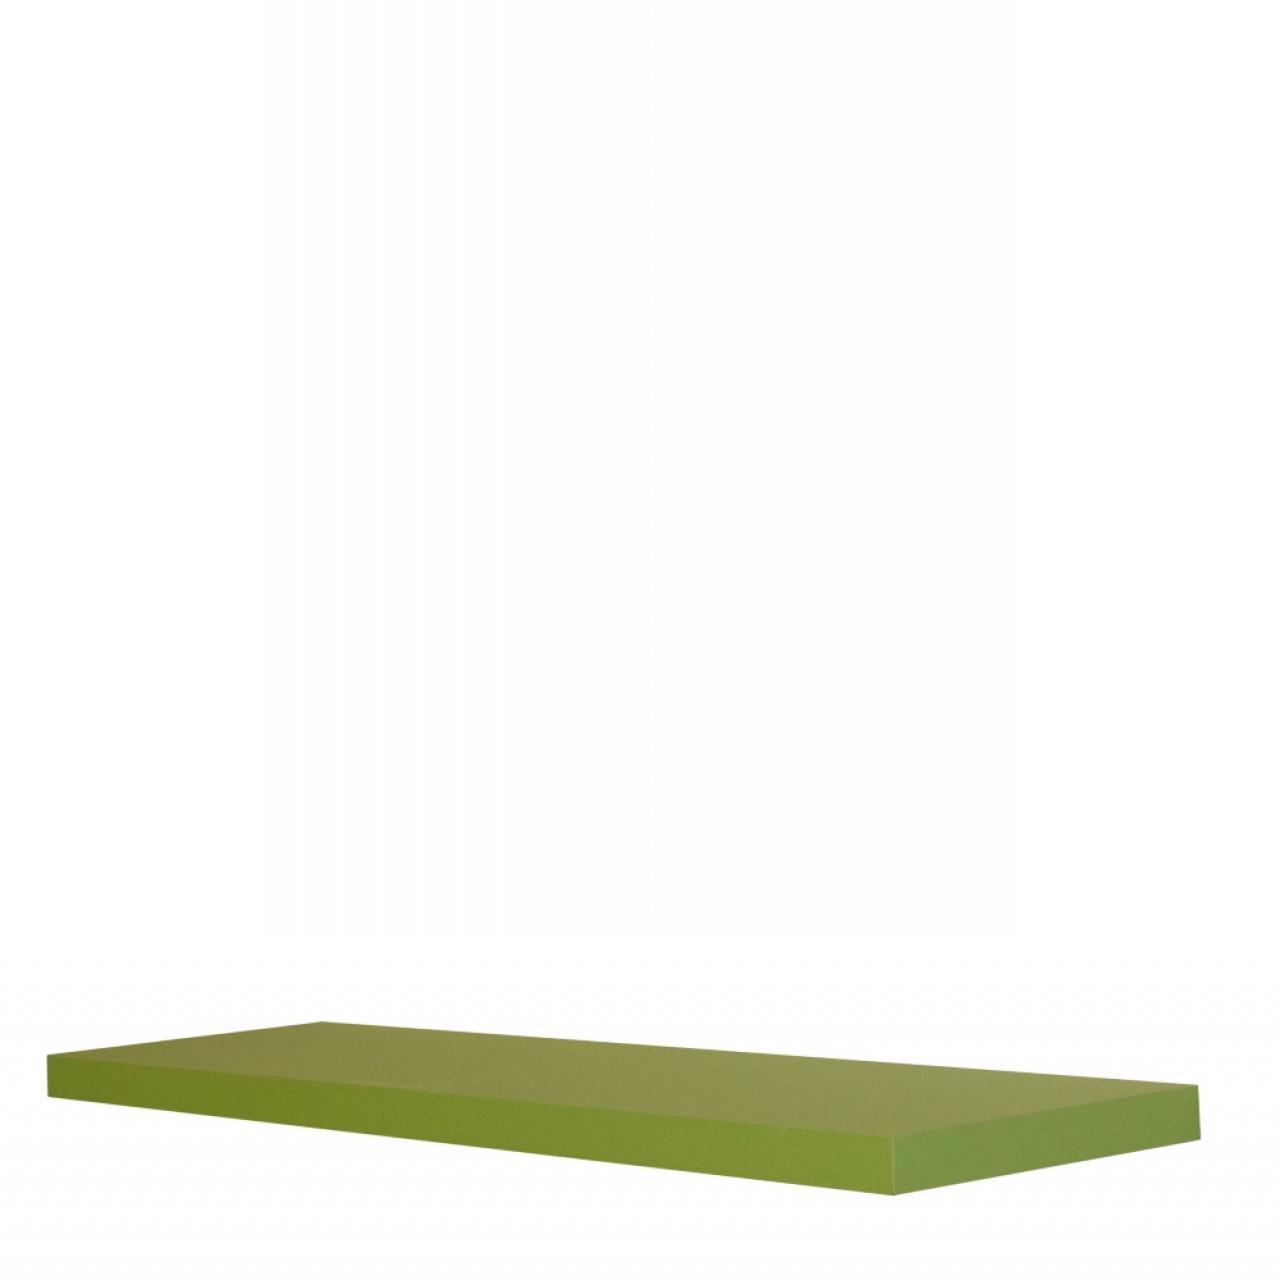 Steckboard 90 cm